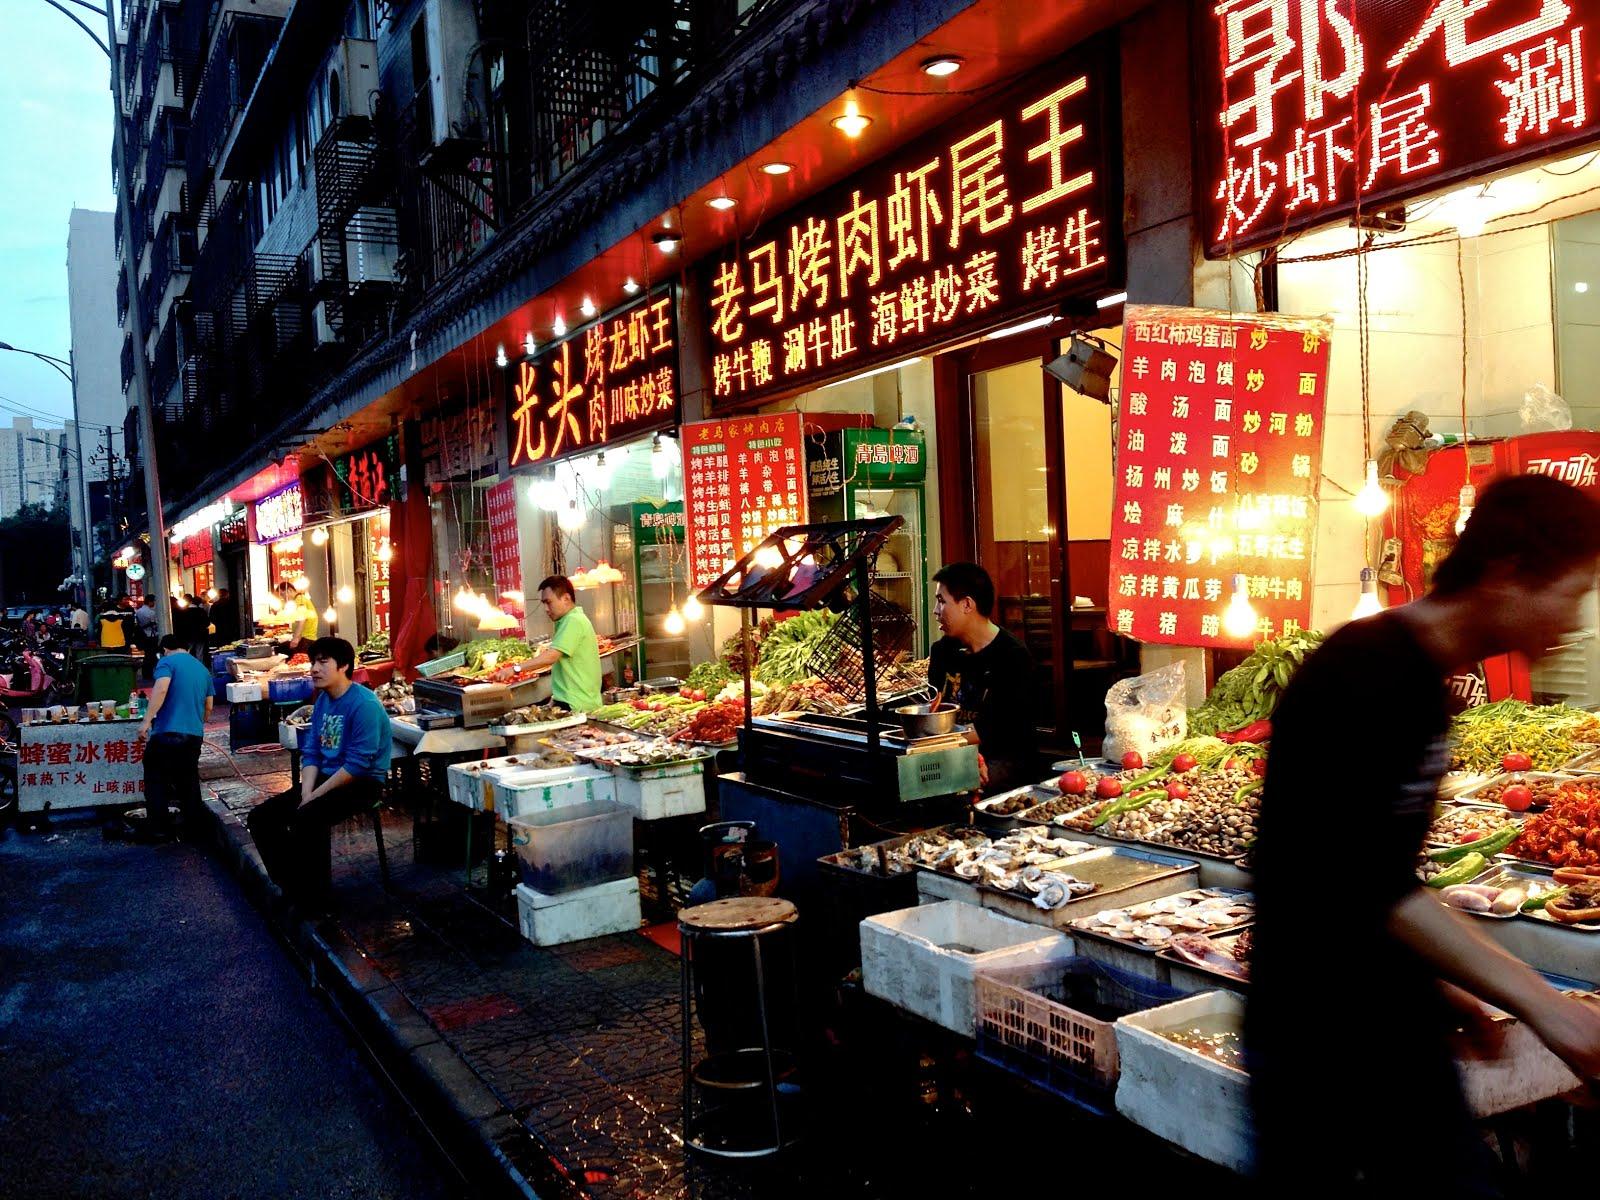 Xi'an Night Market (via    Will Julian  )